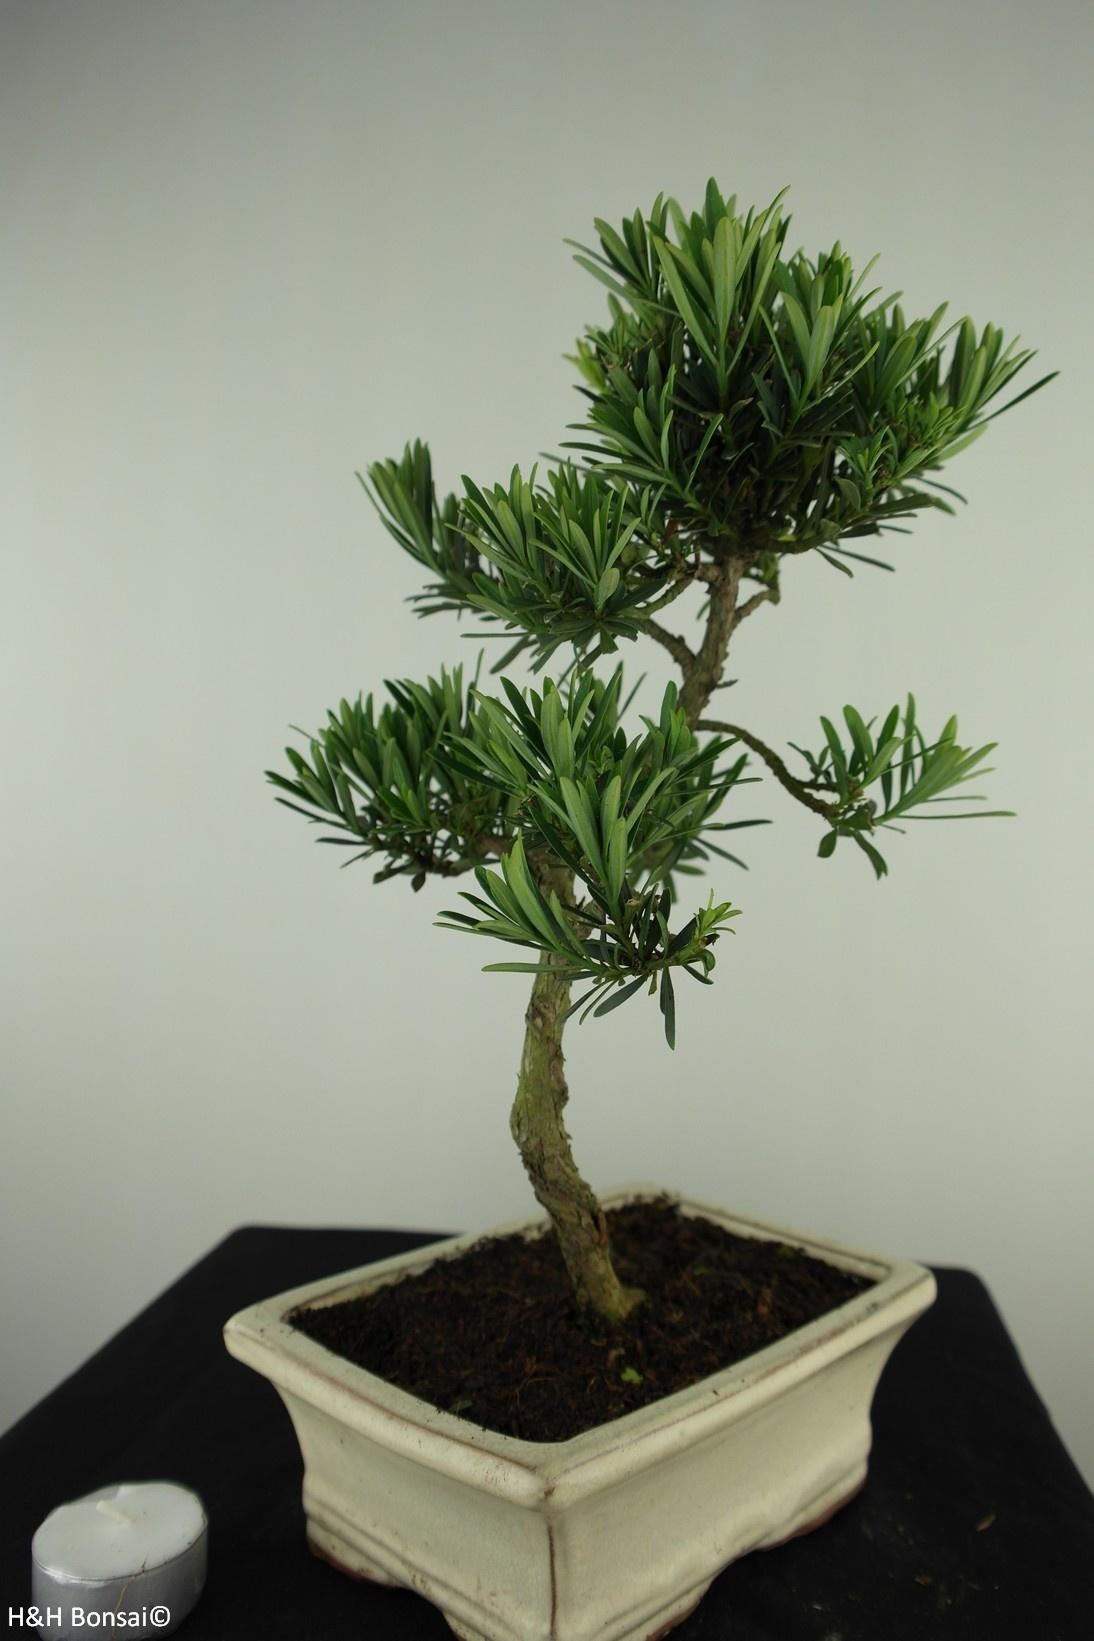 Bonsai Buddhist Pine, Podocarpus, no. 7714